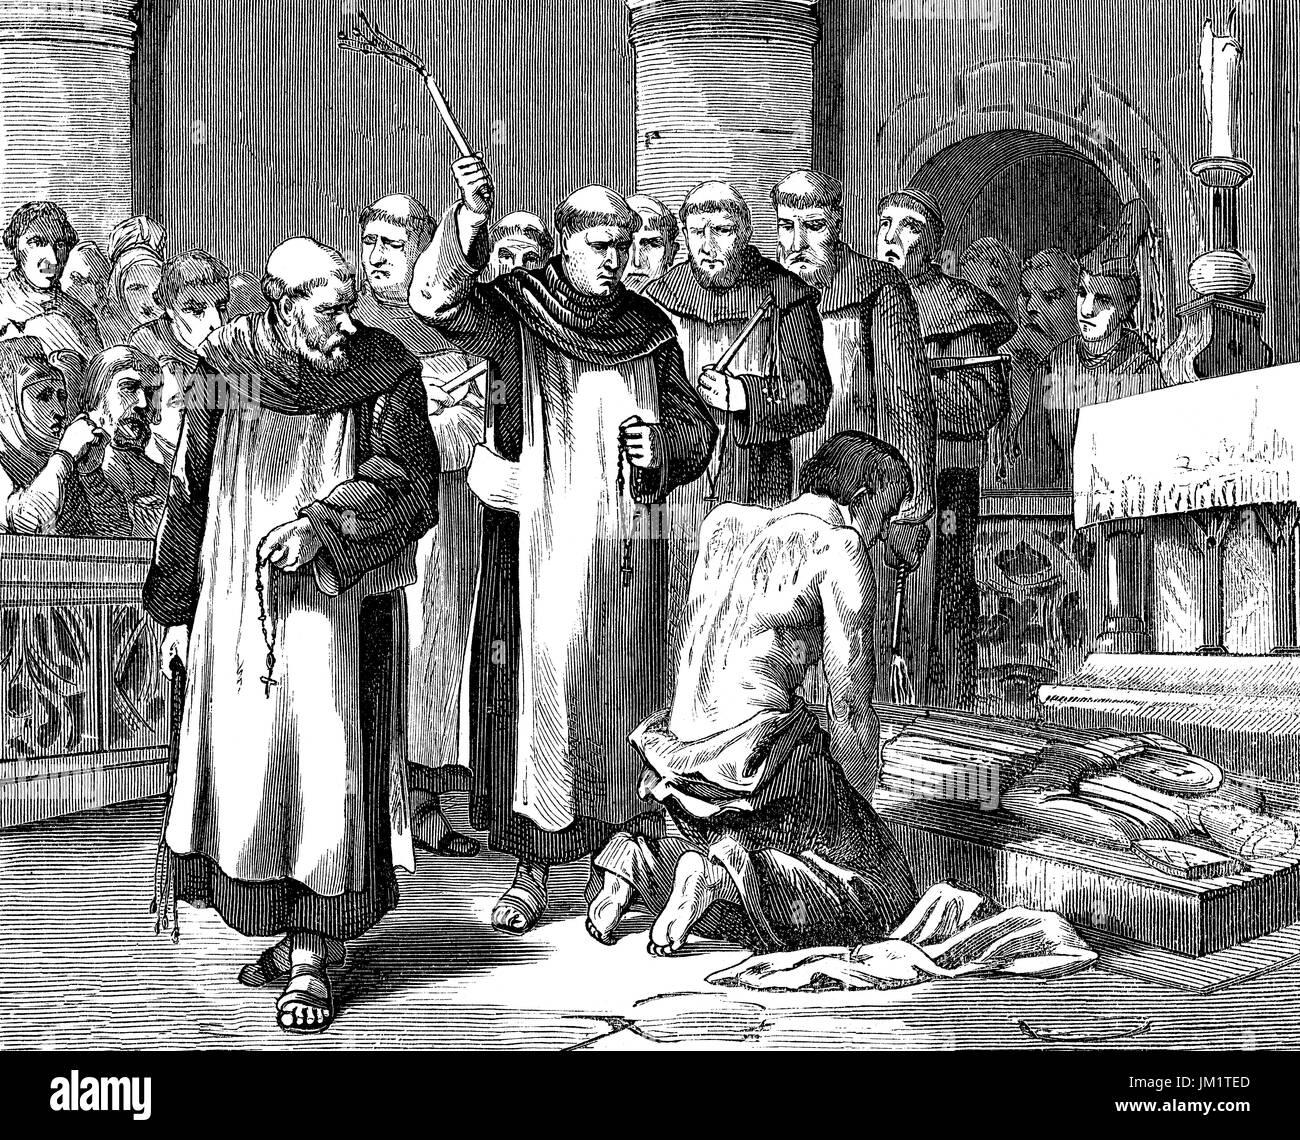 Flagellation of Henry II, or Henry Plantagenet, 1133 - 1189, King of England - Stock Image